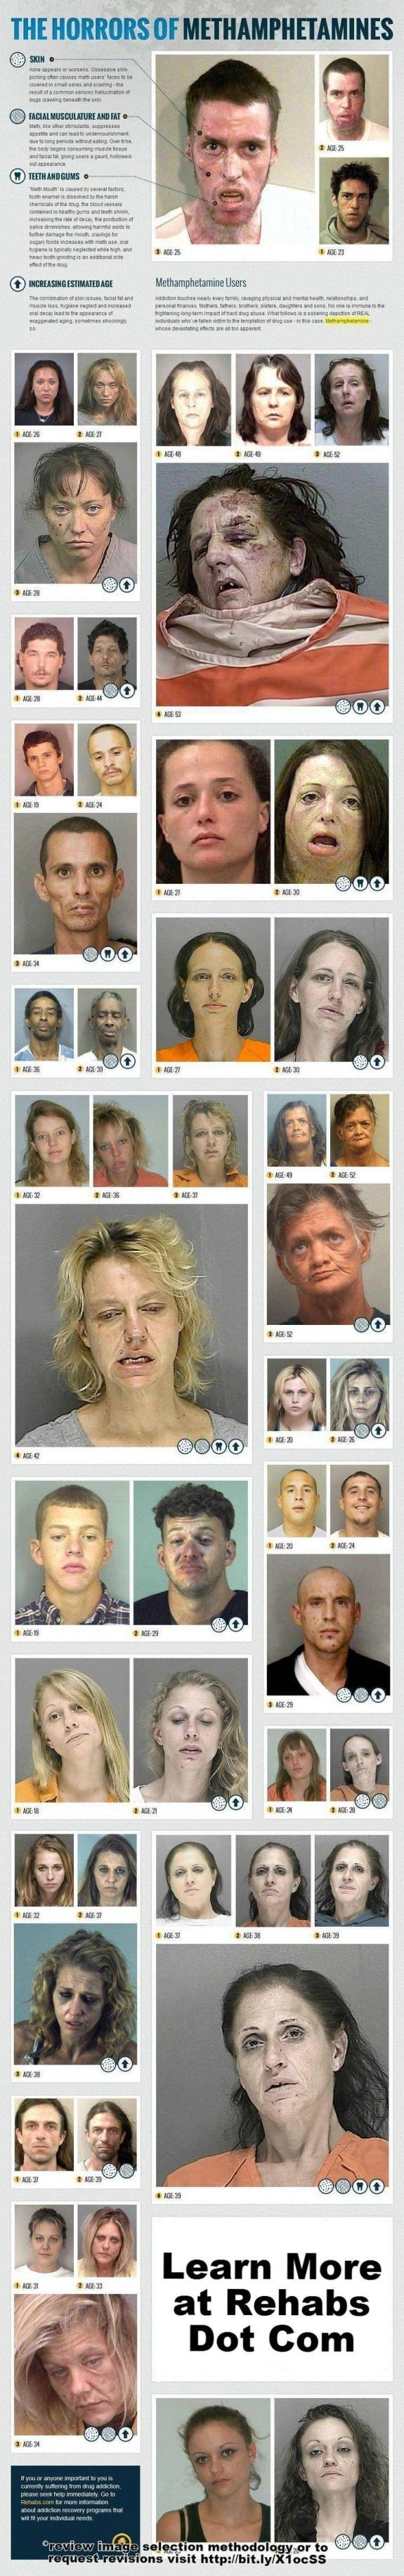 Horrors Of Methamphetamines